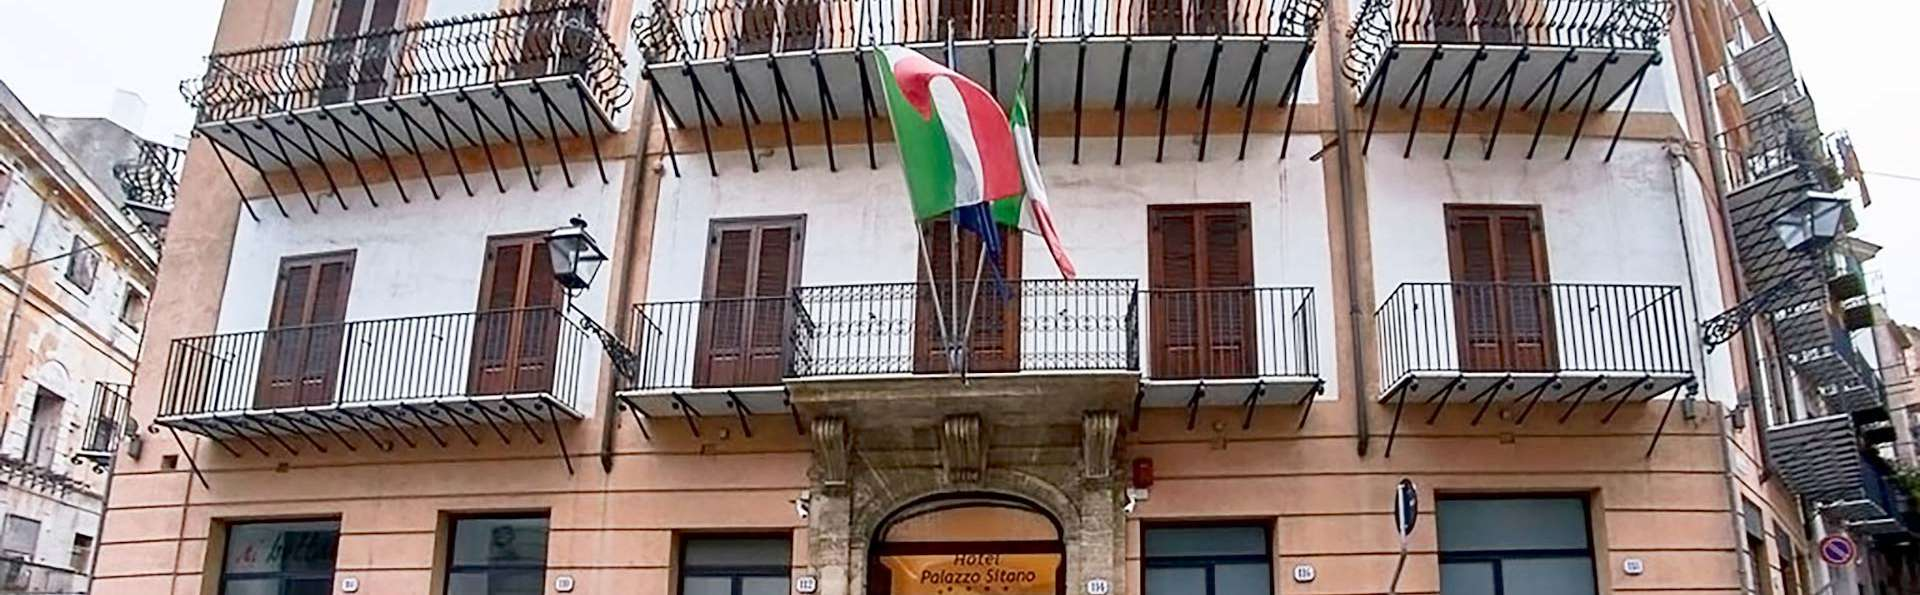 Hotel Palazzo Sitano - EDIT_FRONT_01.jpg